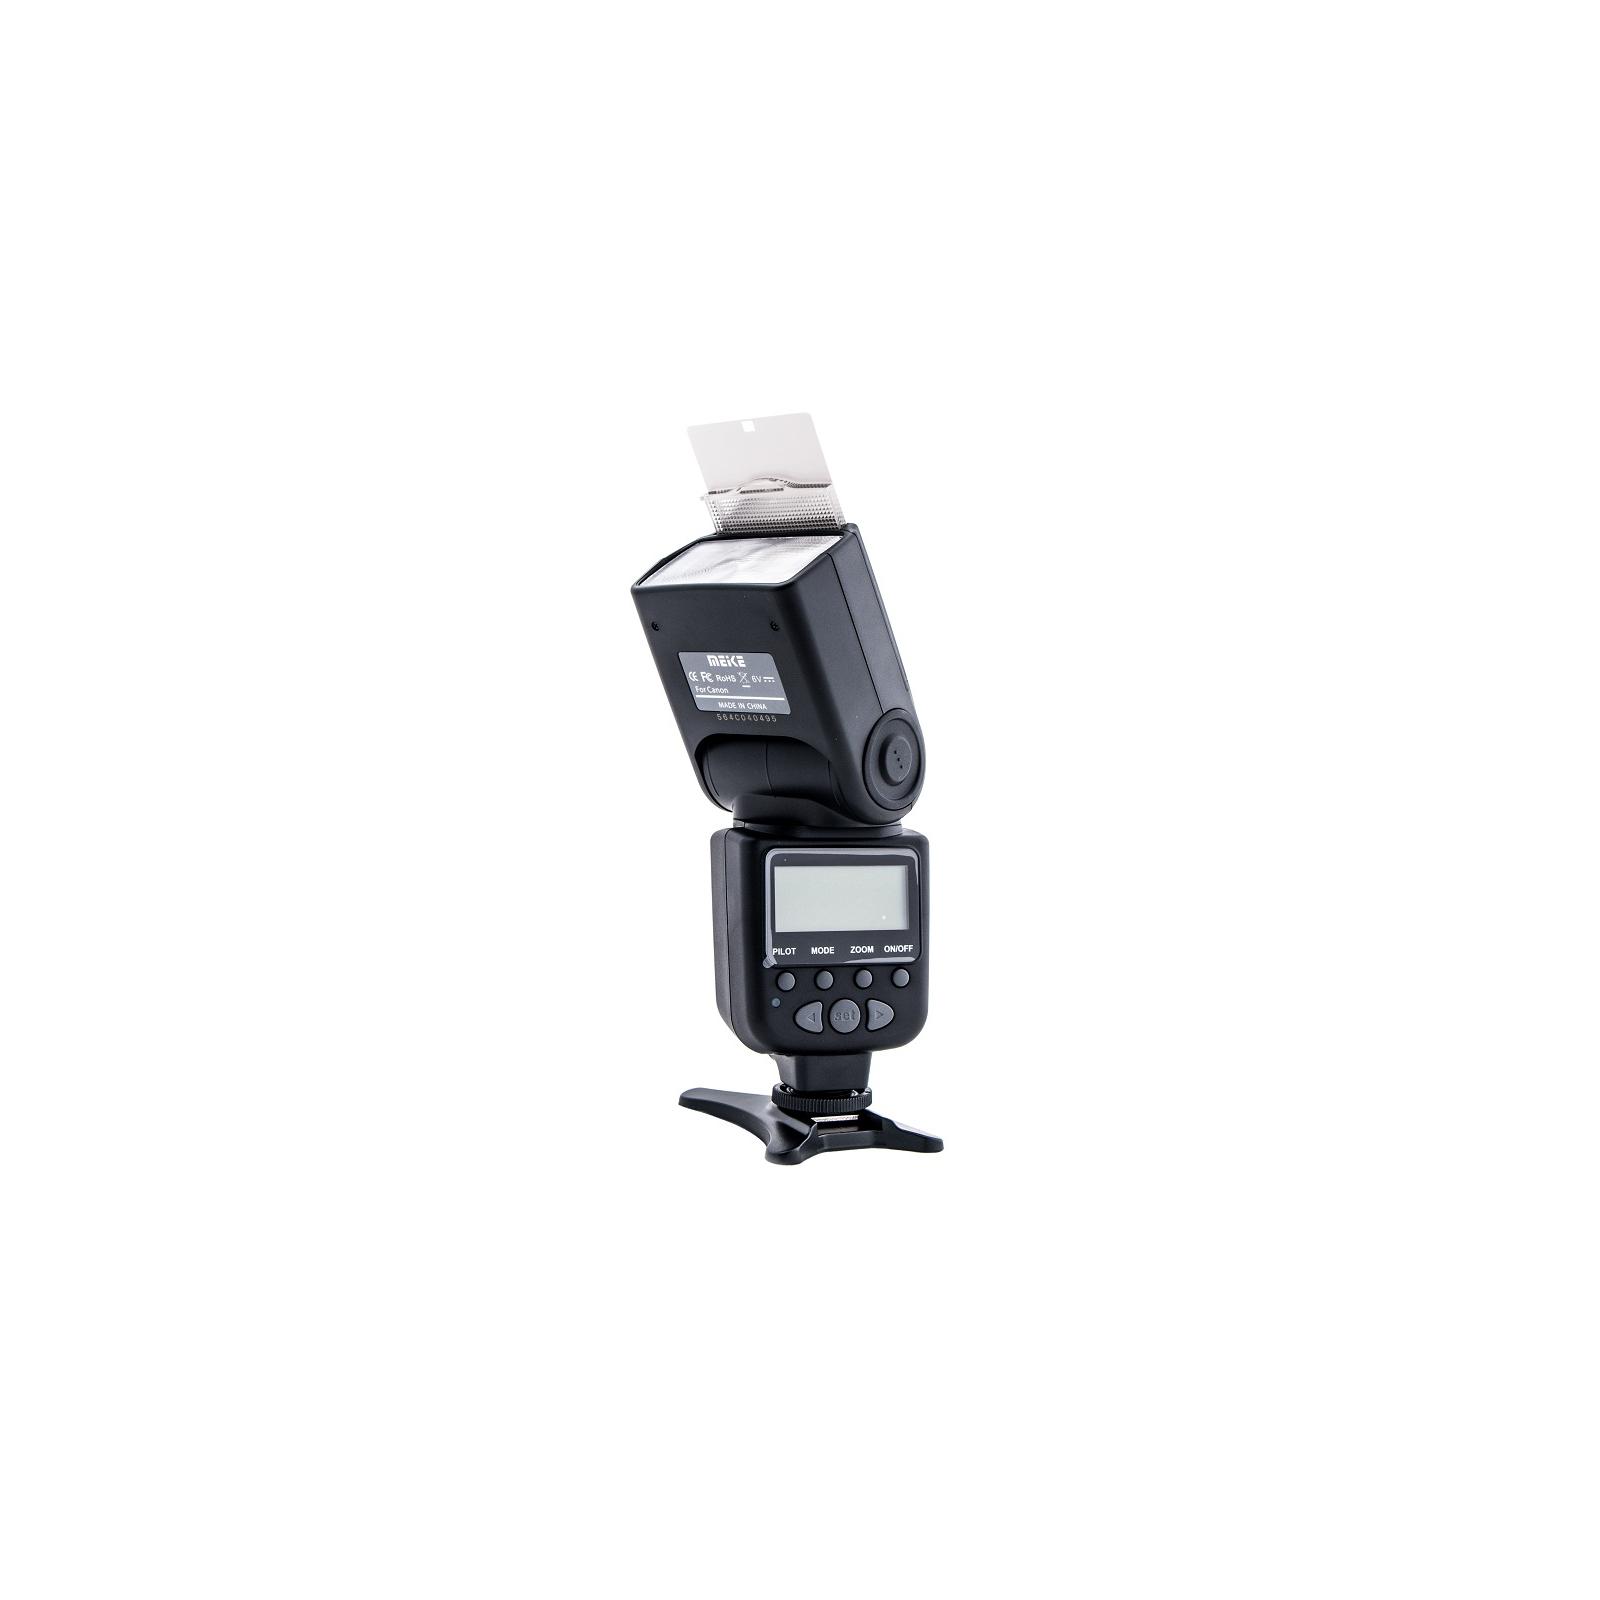 Вспышка Meike Nikon 950 II (MK950N2) изображение 2